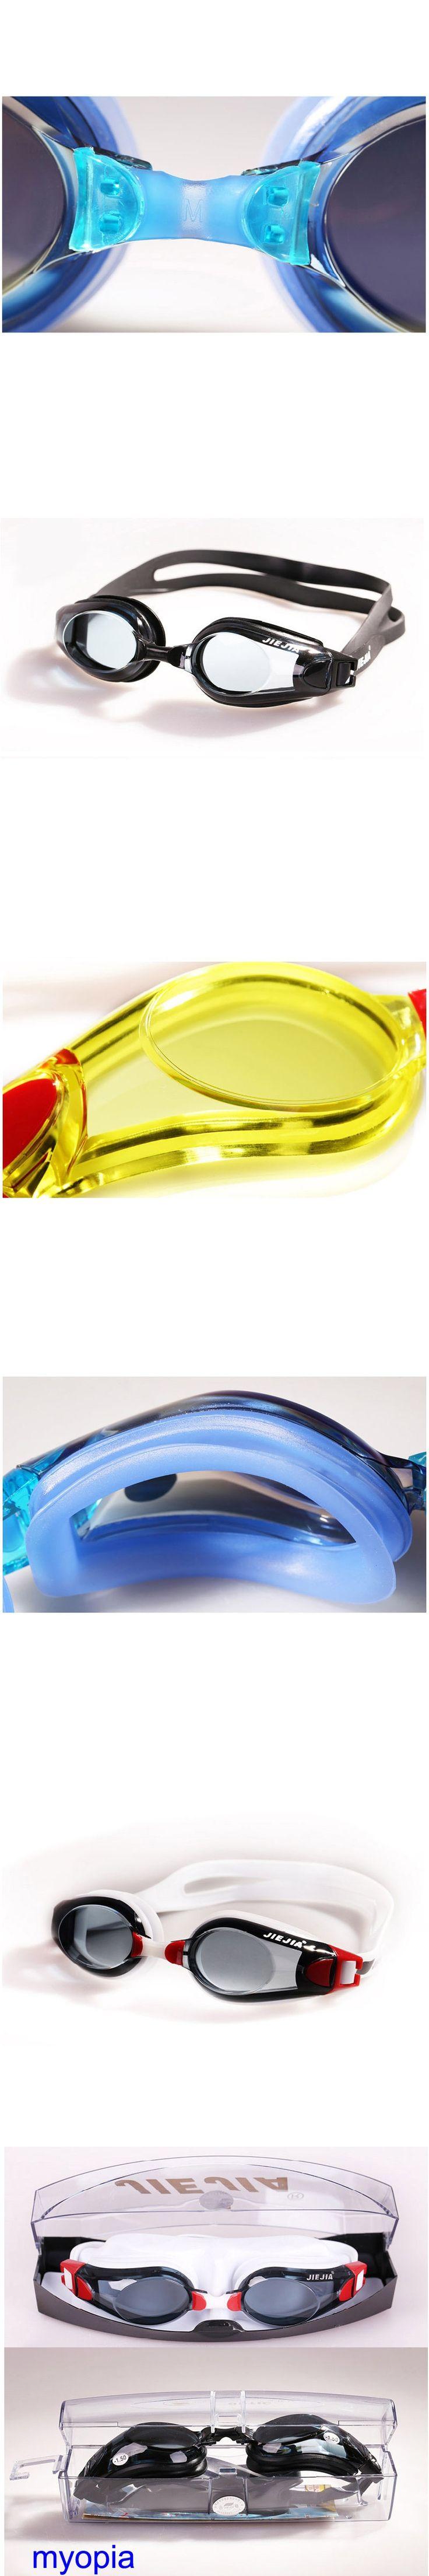 Professional Swimming glasses men and women arena water glasse anti fog Adult swimming goggles natacion  Swim Eyewear